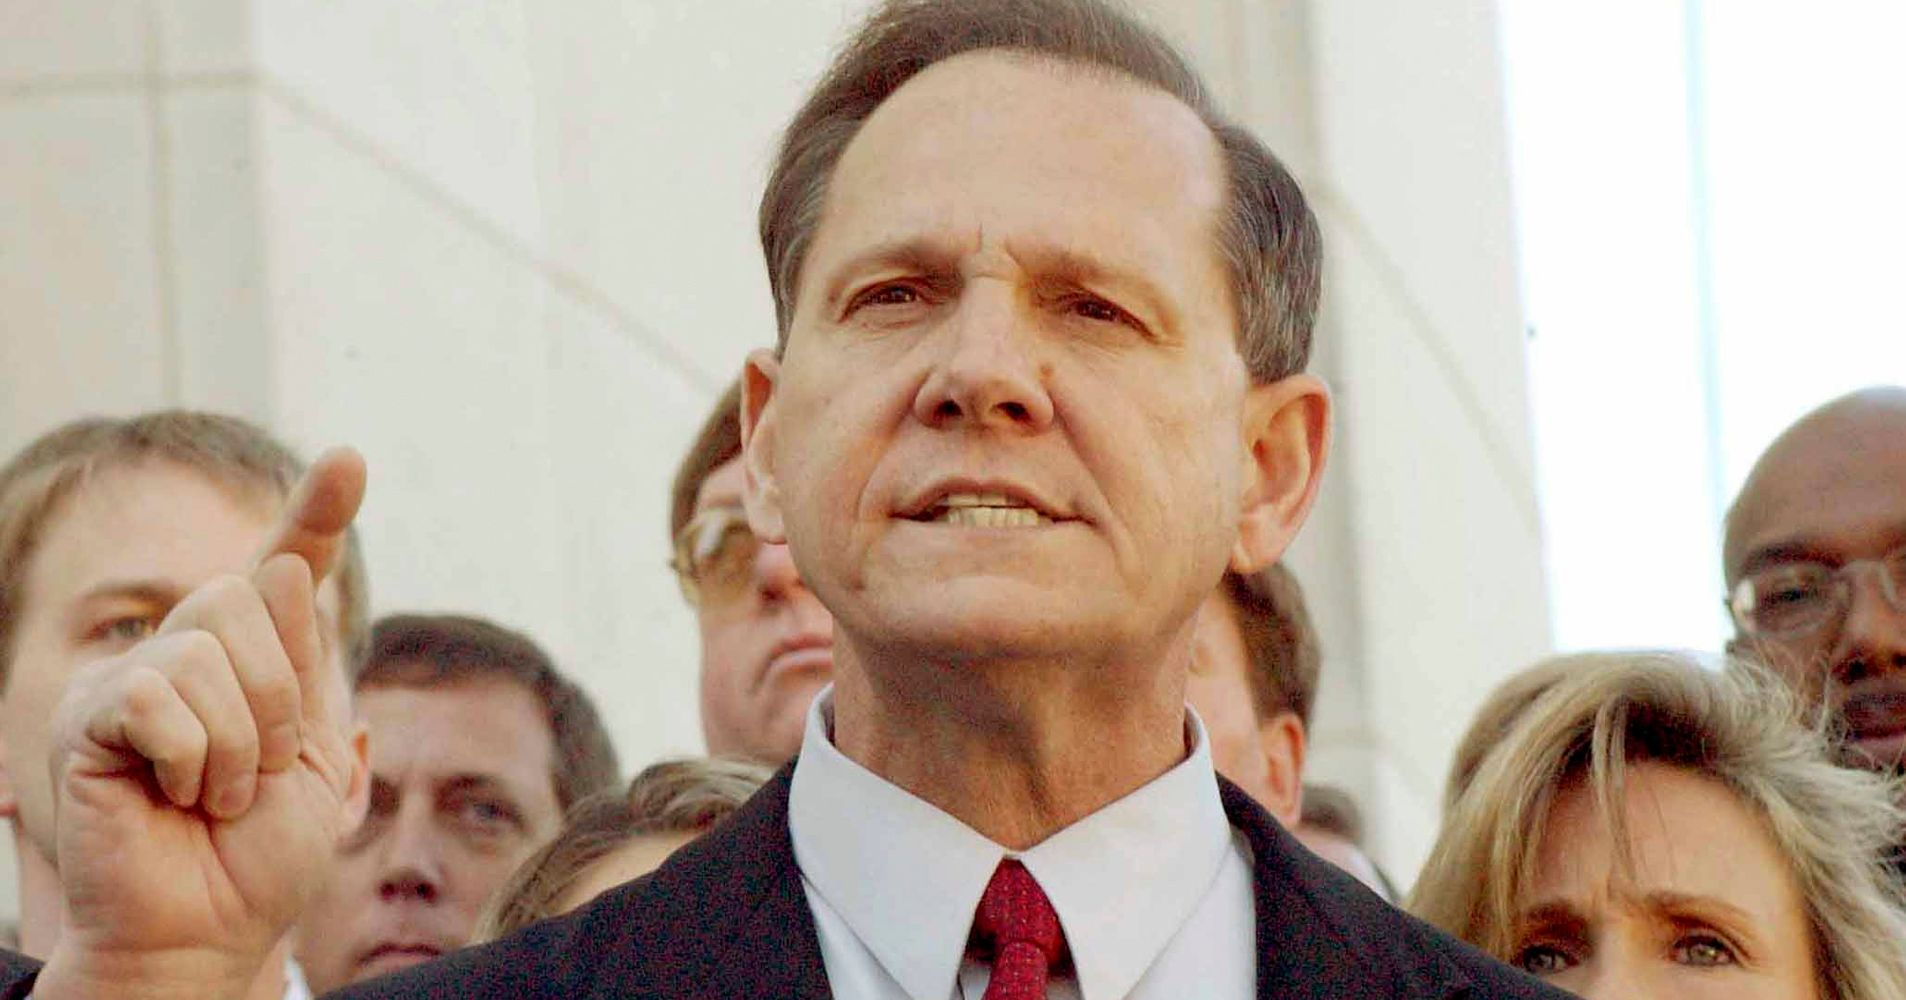 Alabama Front-Runner For U.S. Senate Seat Calls Islam A 'False Religion'